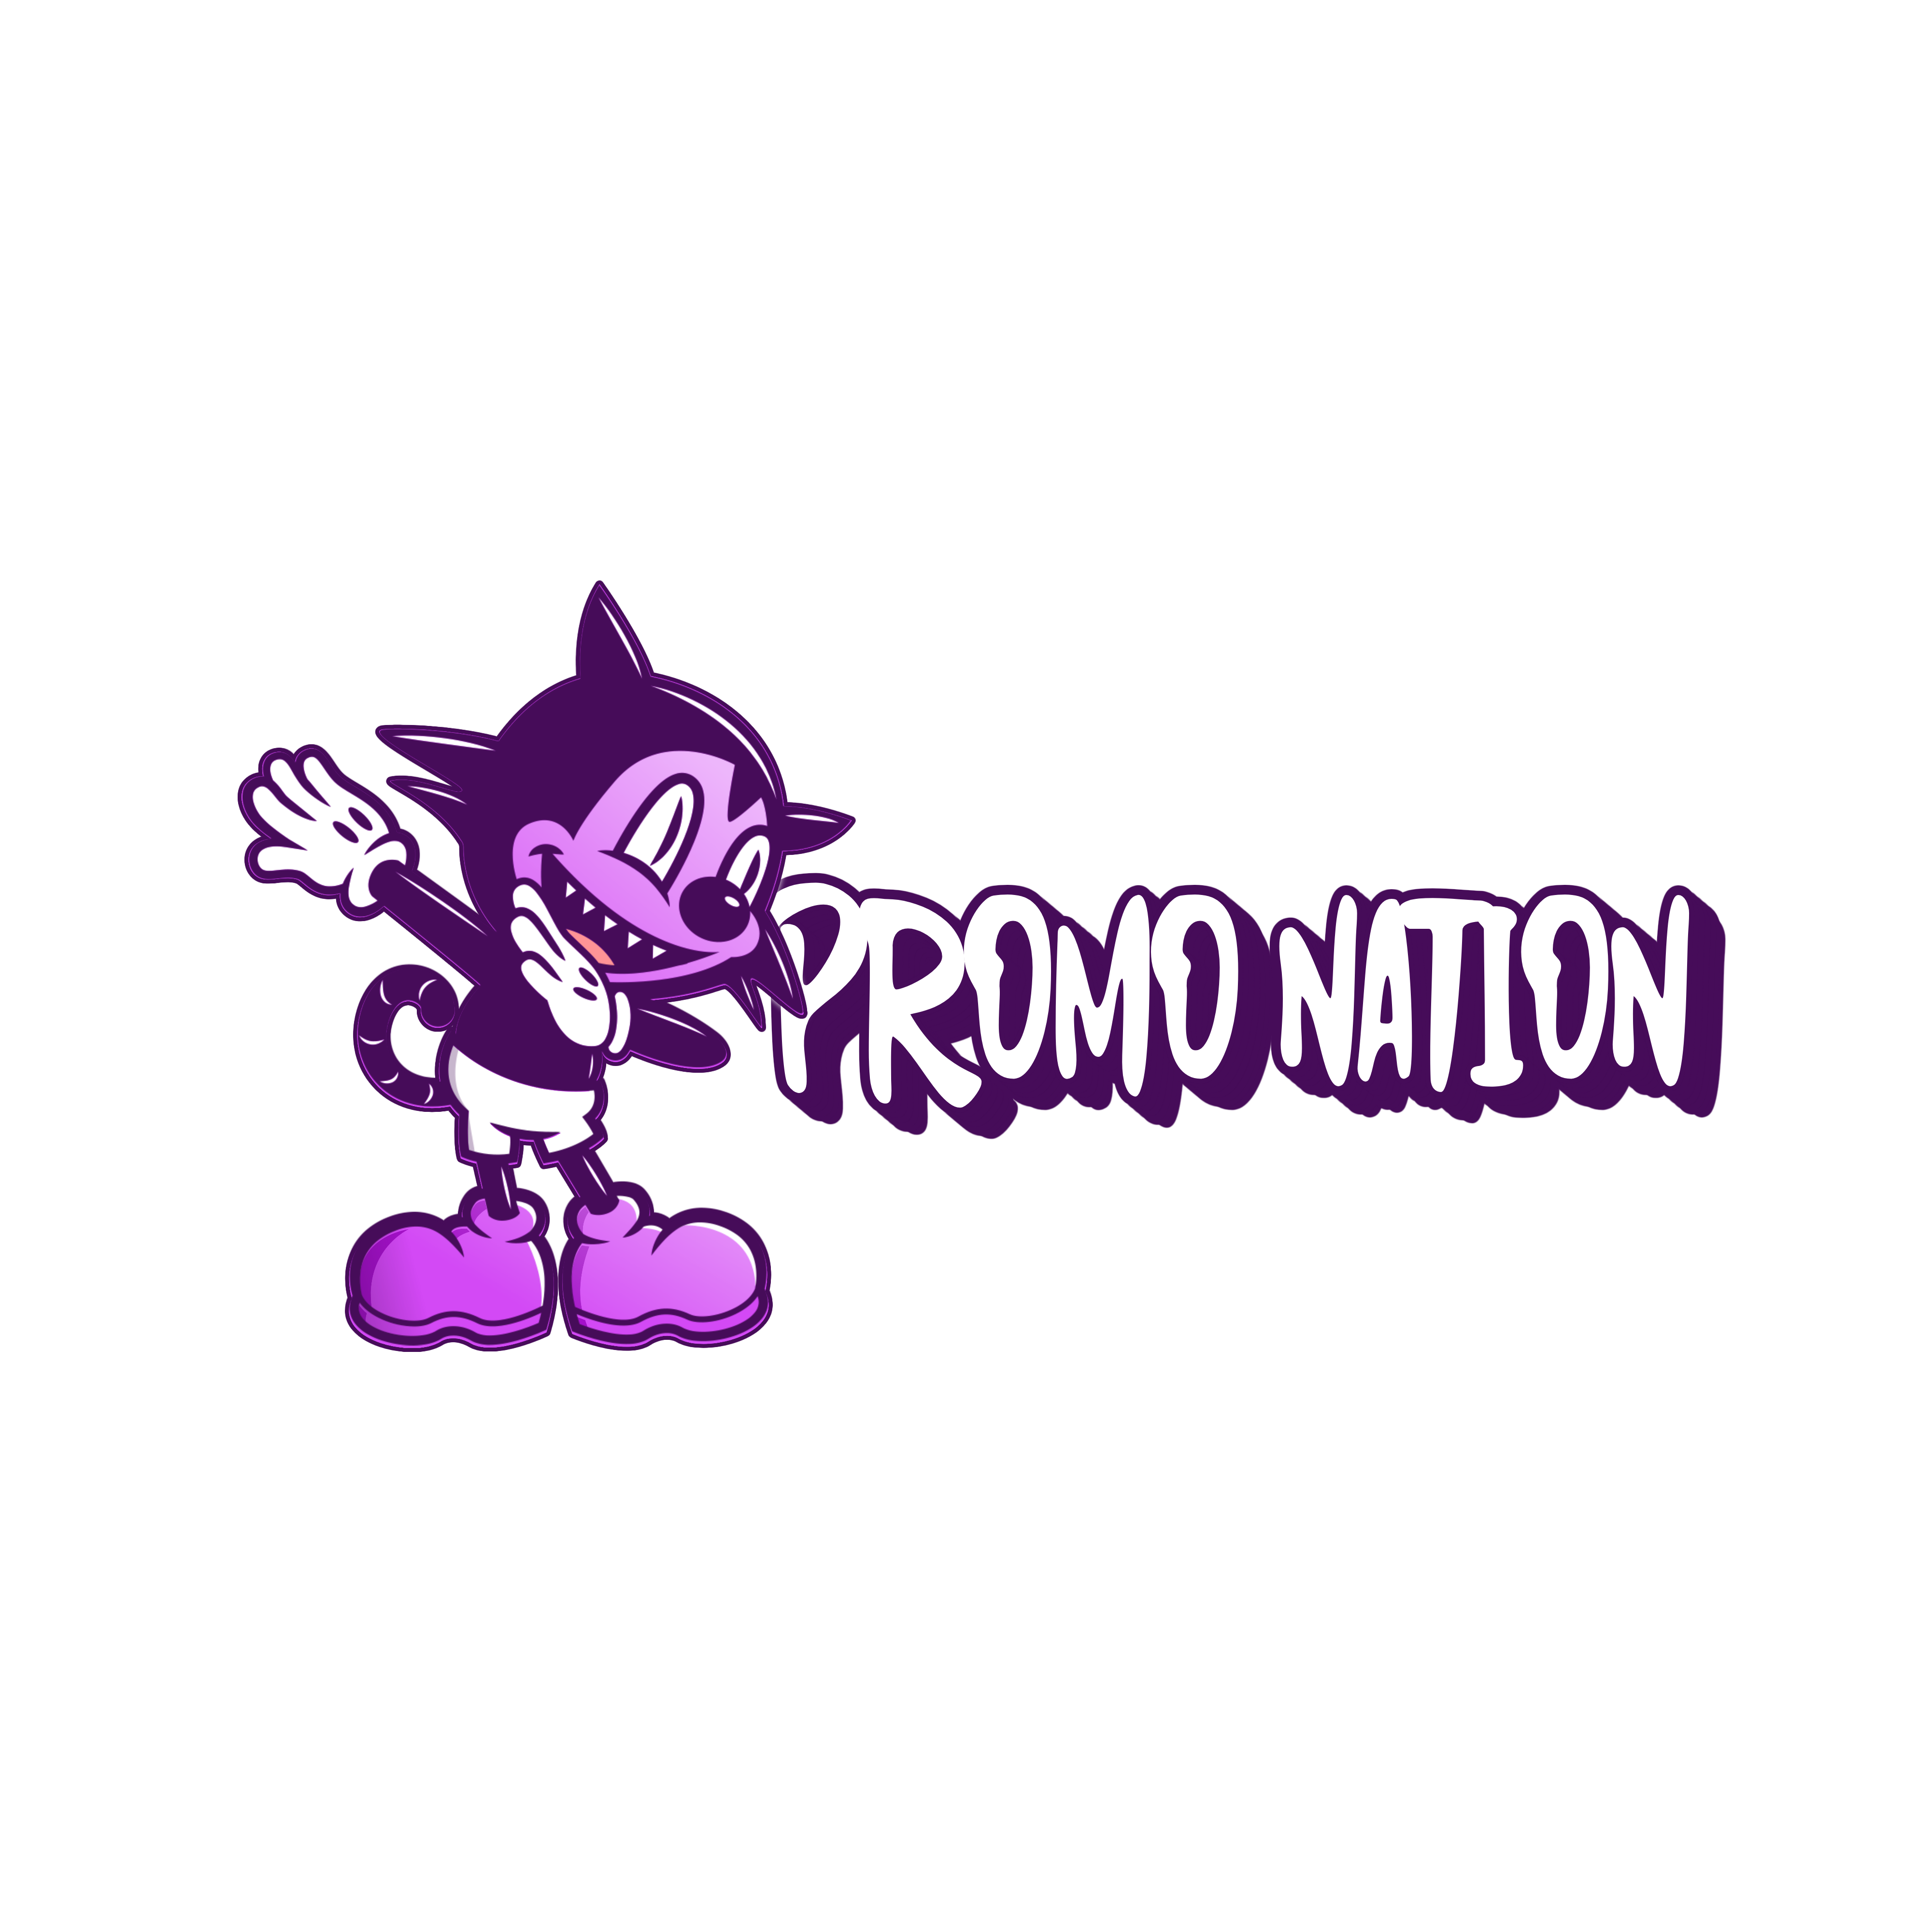 The PromoNation